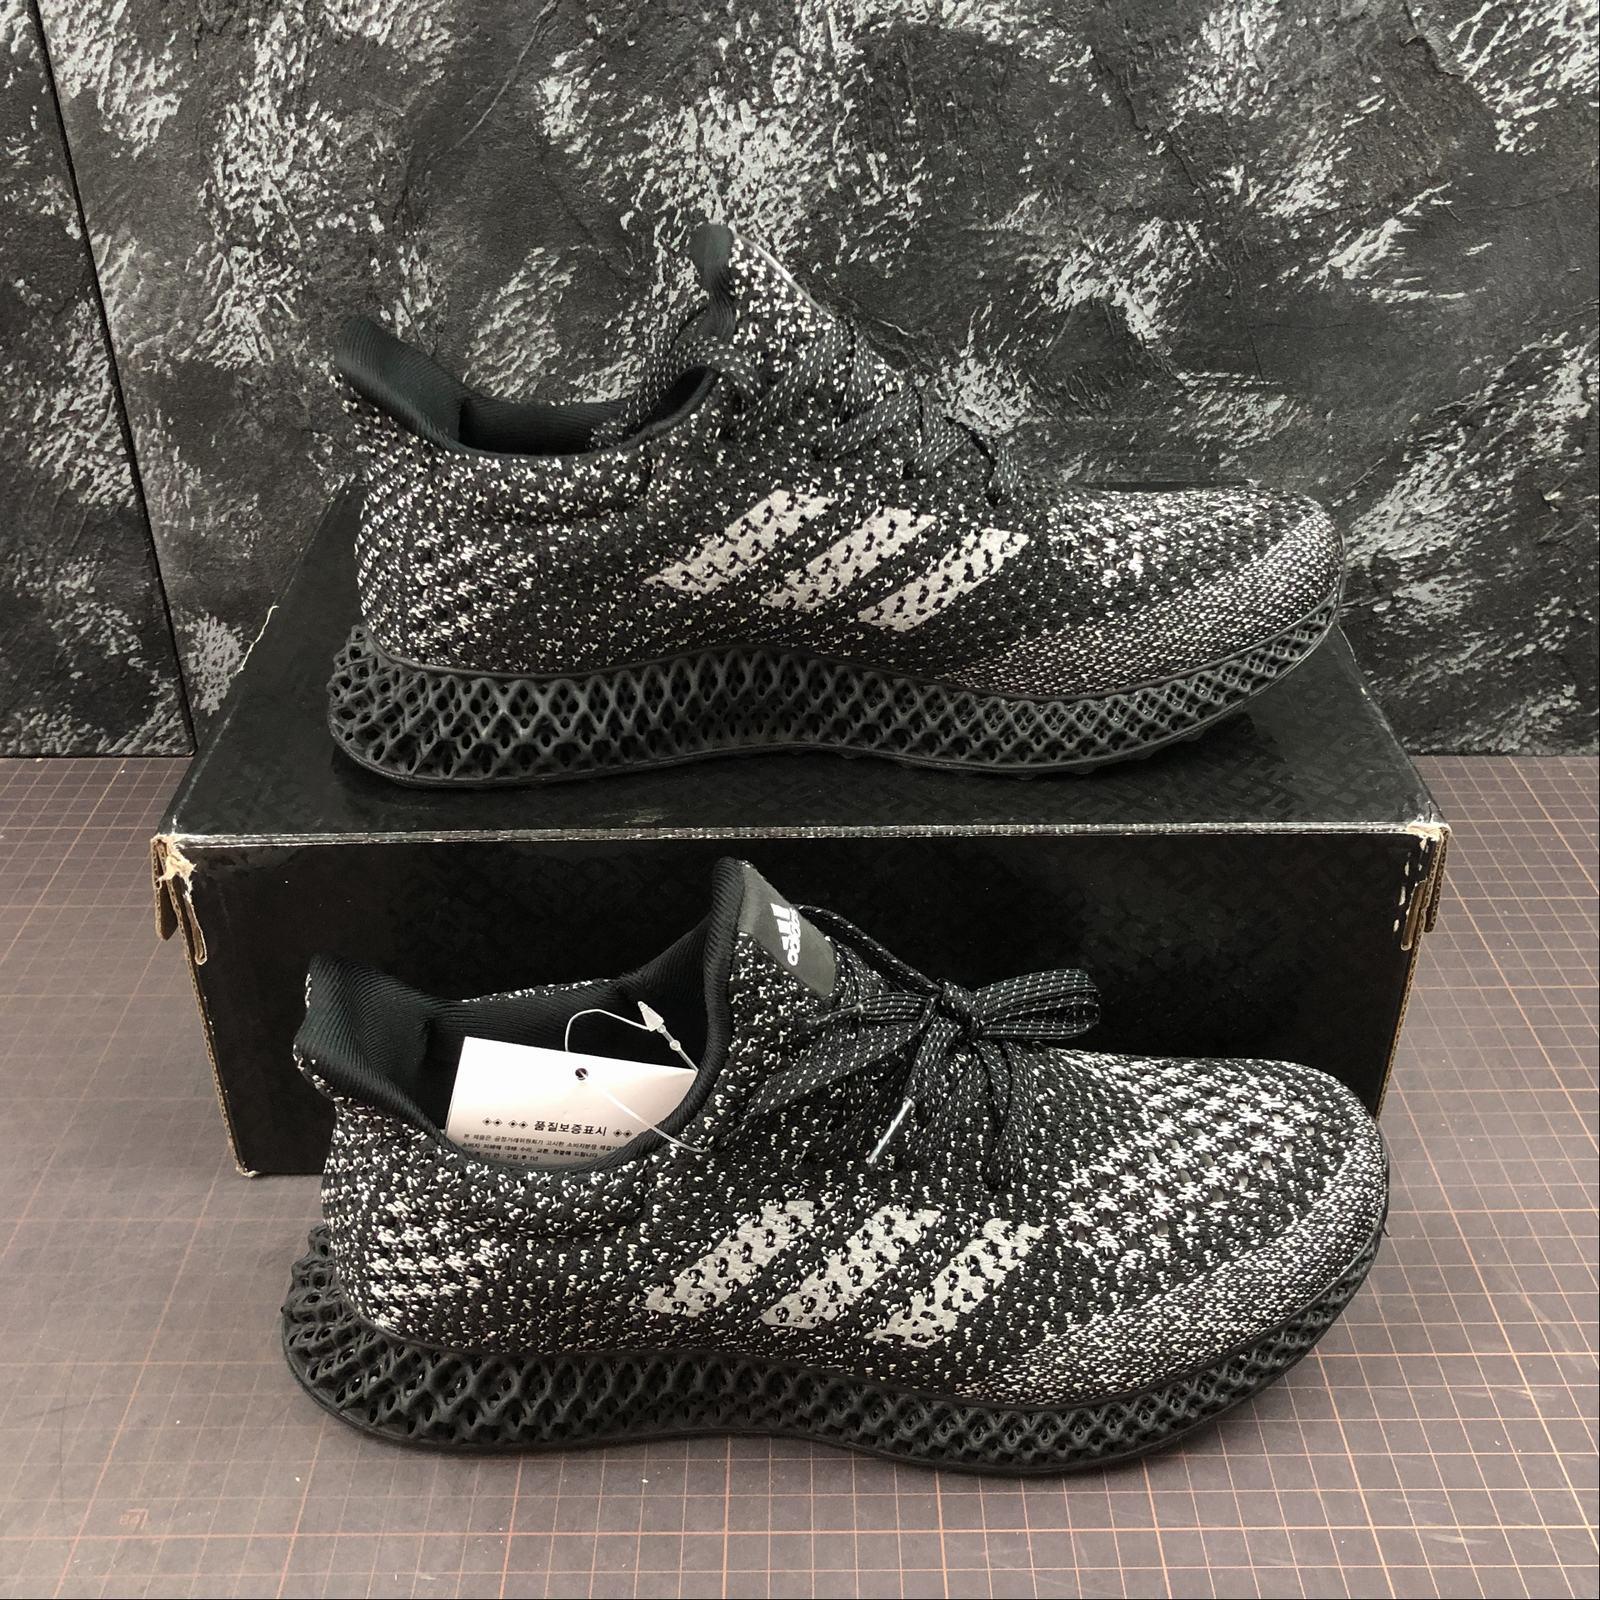 giay-sneaker-adidas-futurecraft-4d-b75945-black